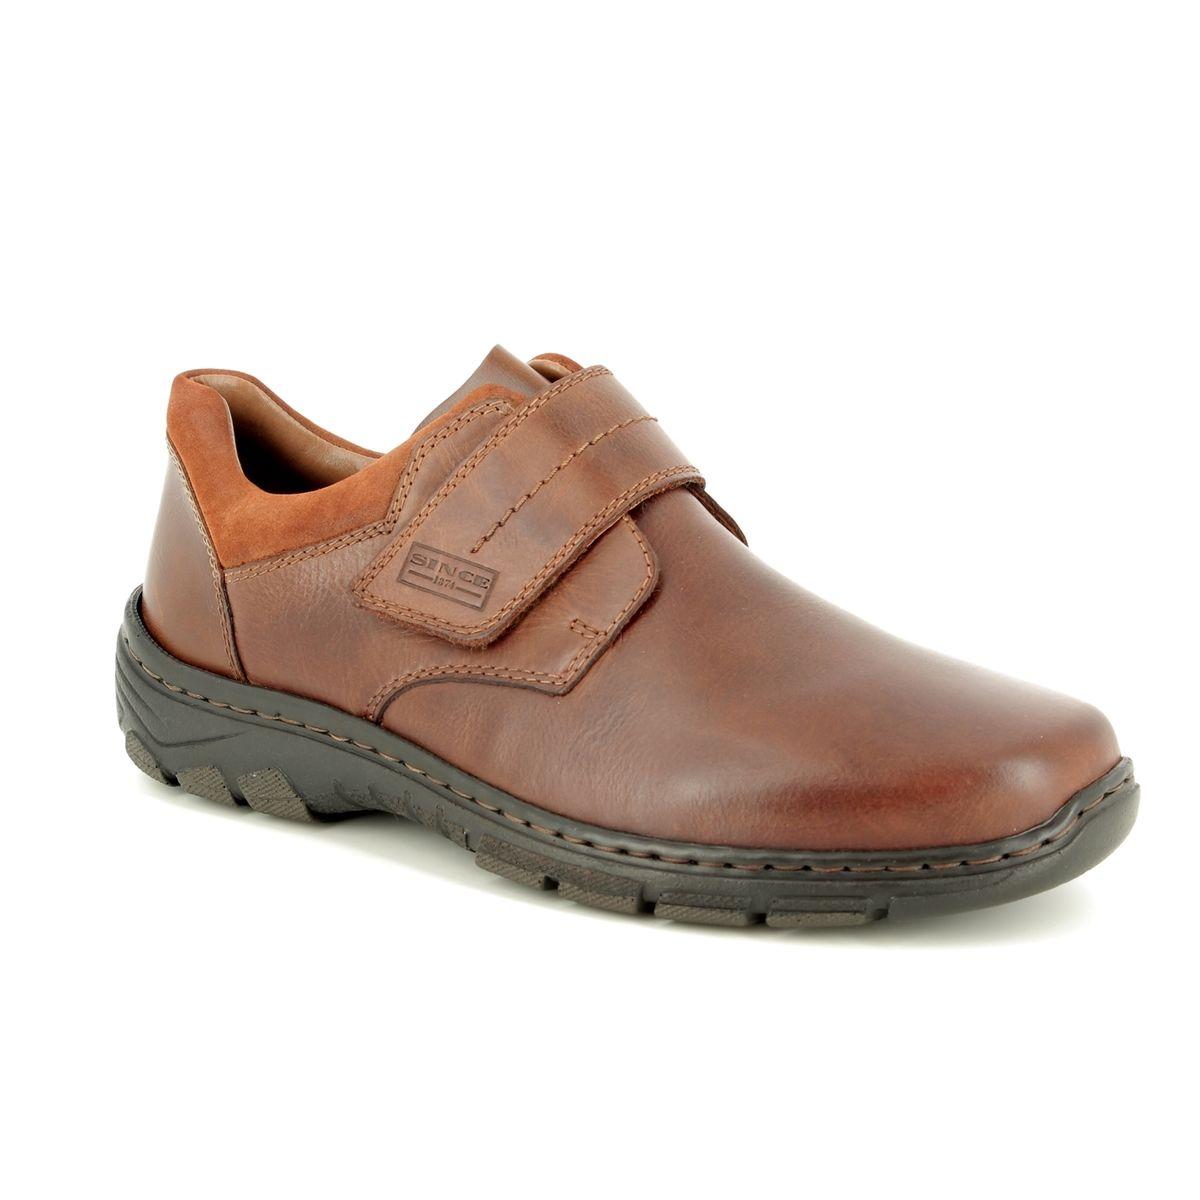 e75f351e16a5 Rieker Casual Shoes - Brown - 19962-25 RAMVEL 85